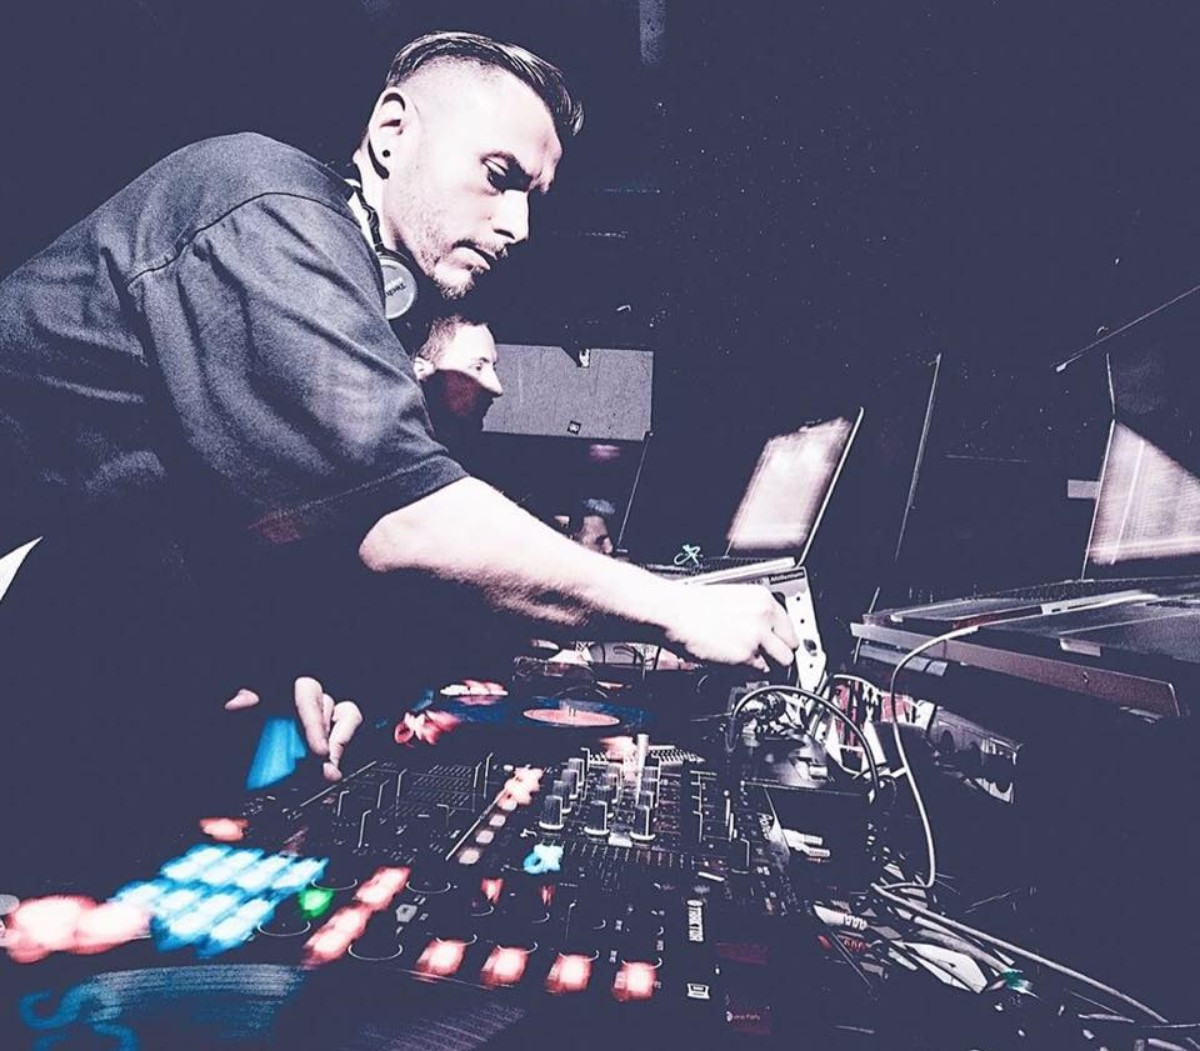 DJ Reaf, Drop, Tamas, Berlin, Trap